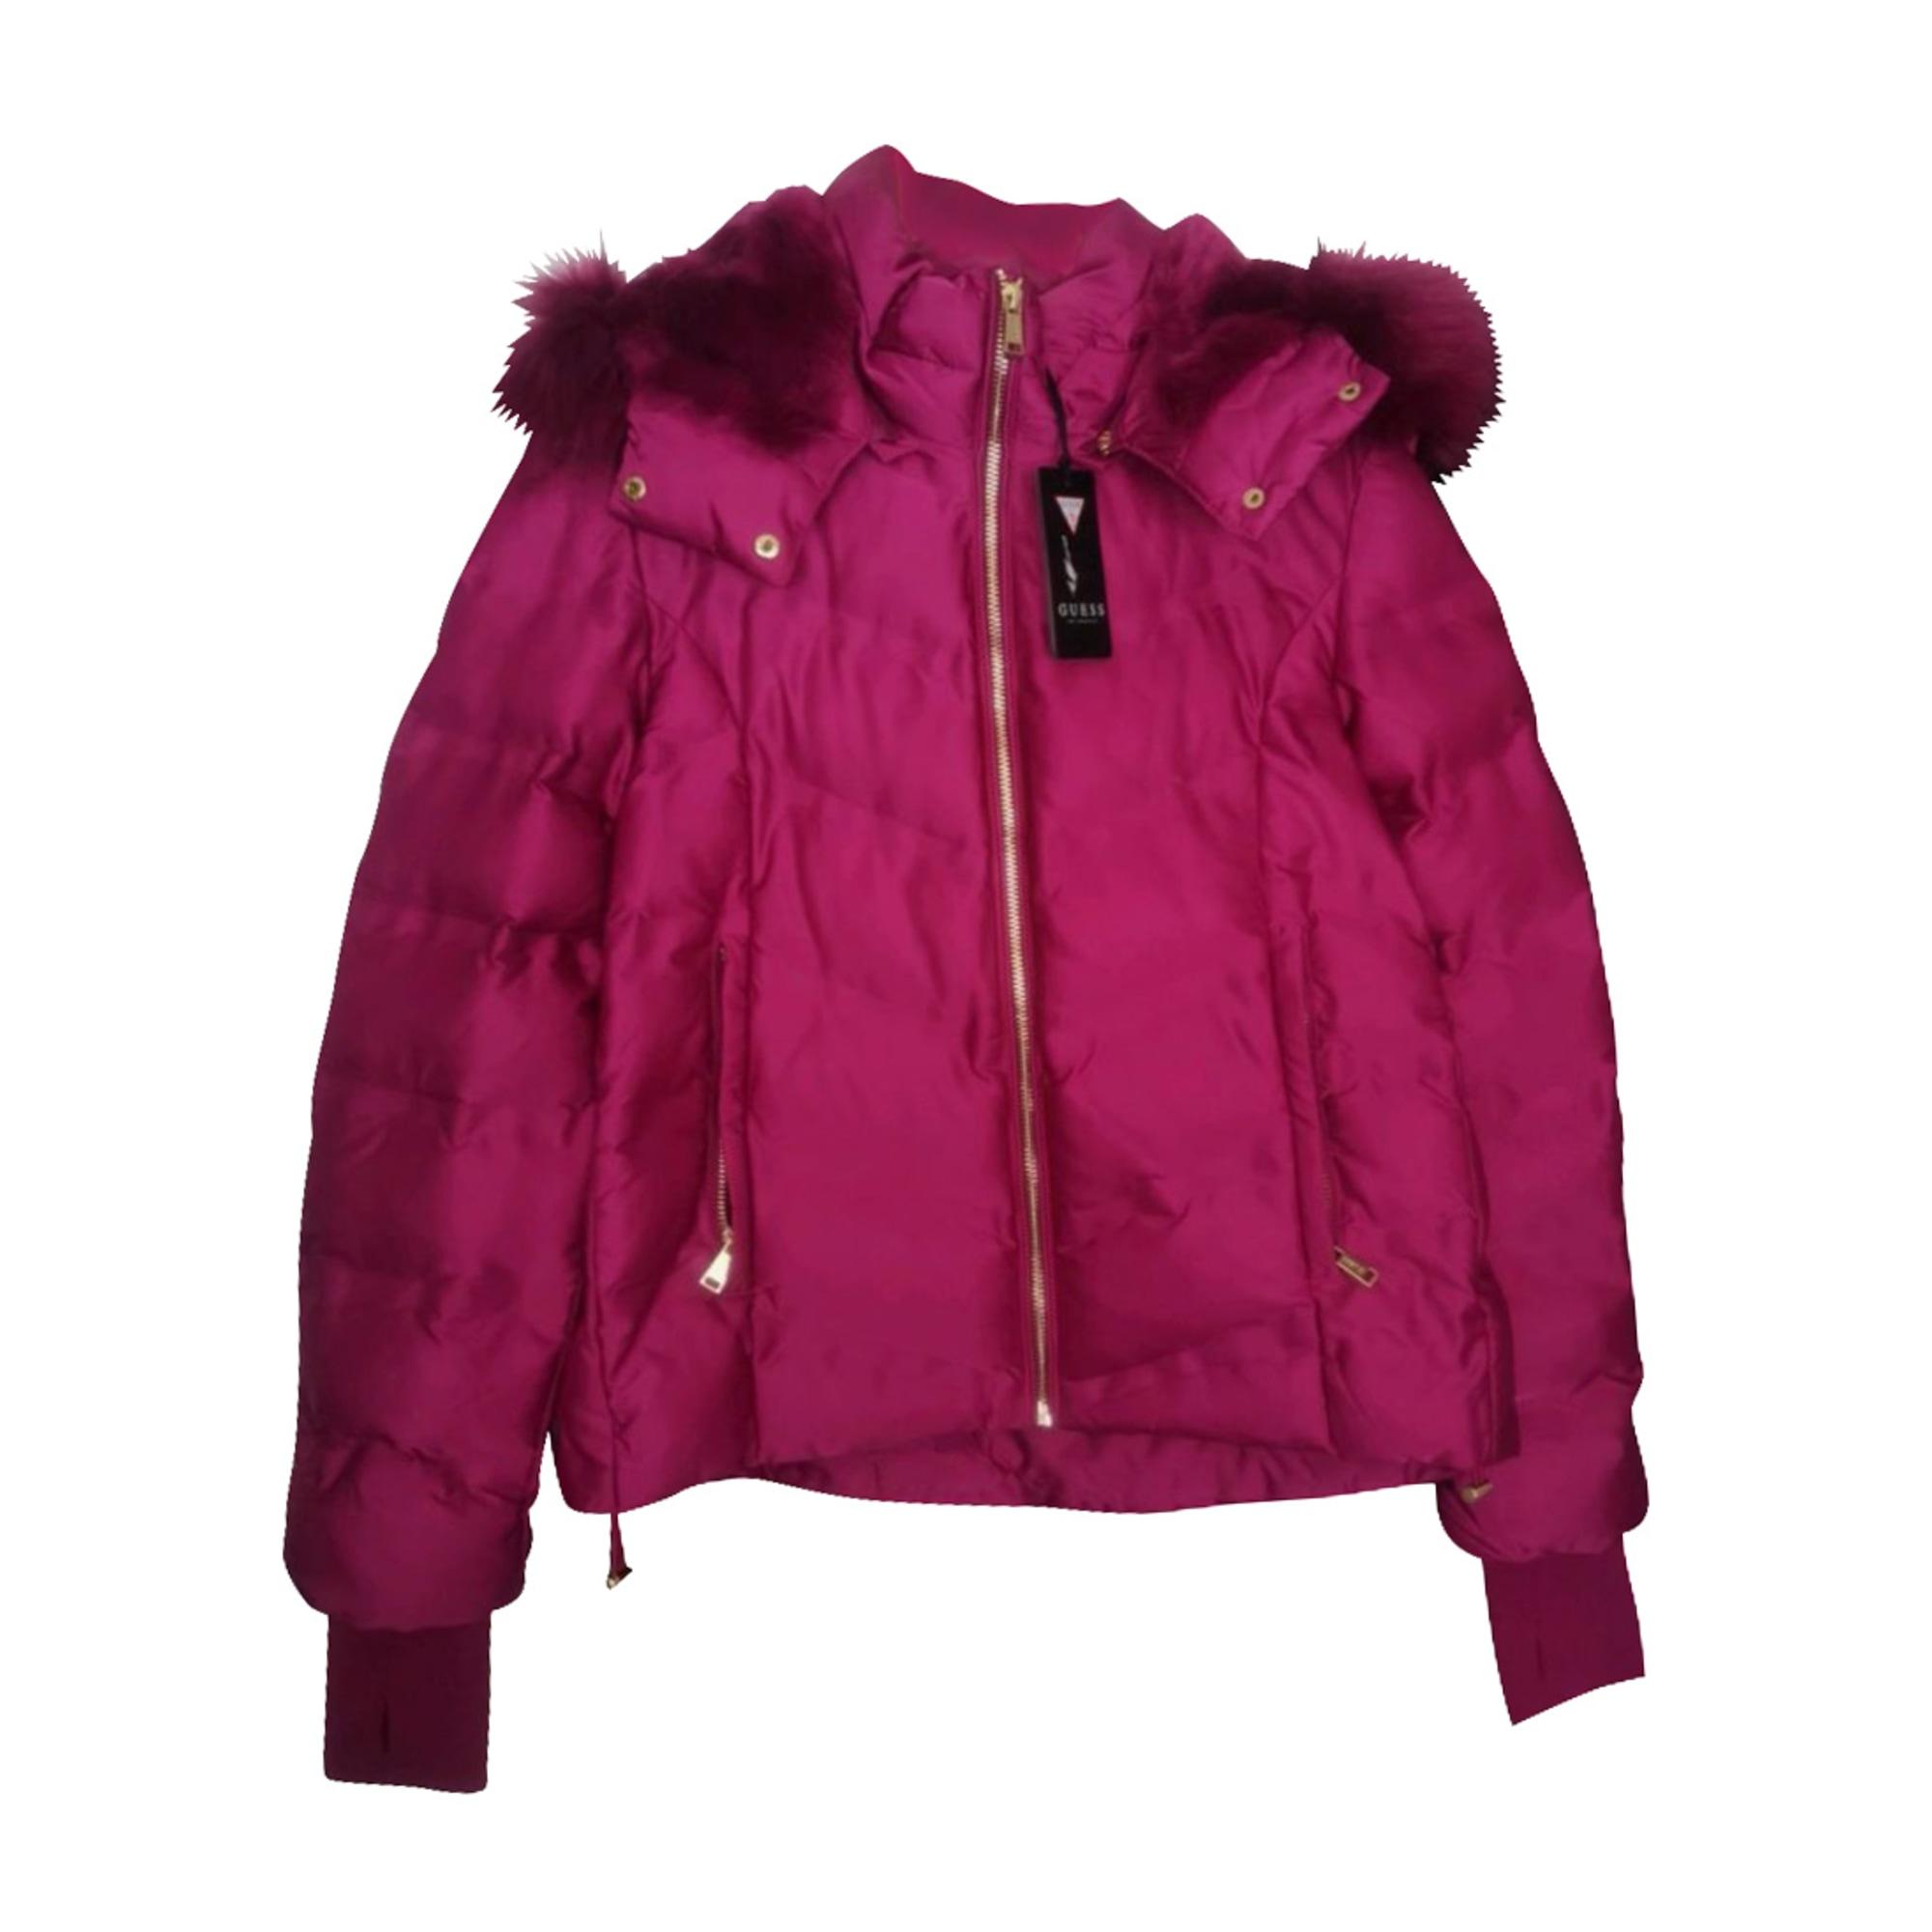 Down Jacket GUESS Pink, fuchsia, light pink